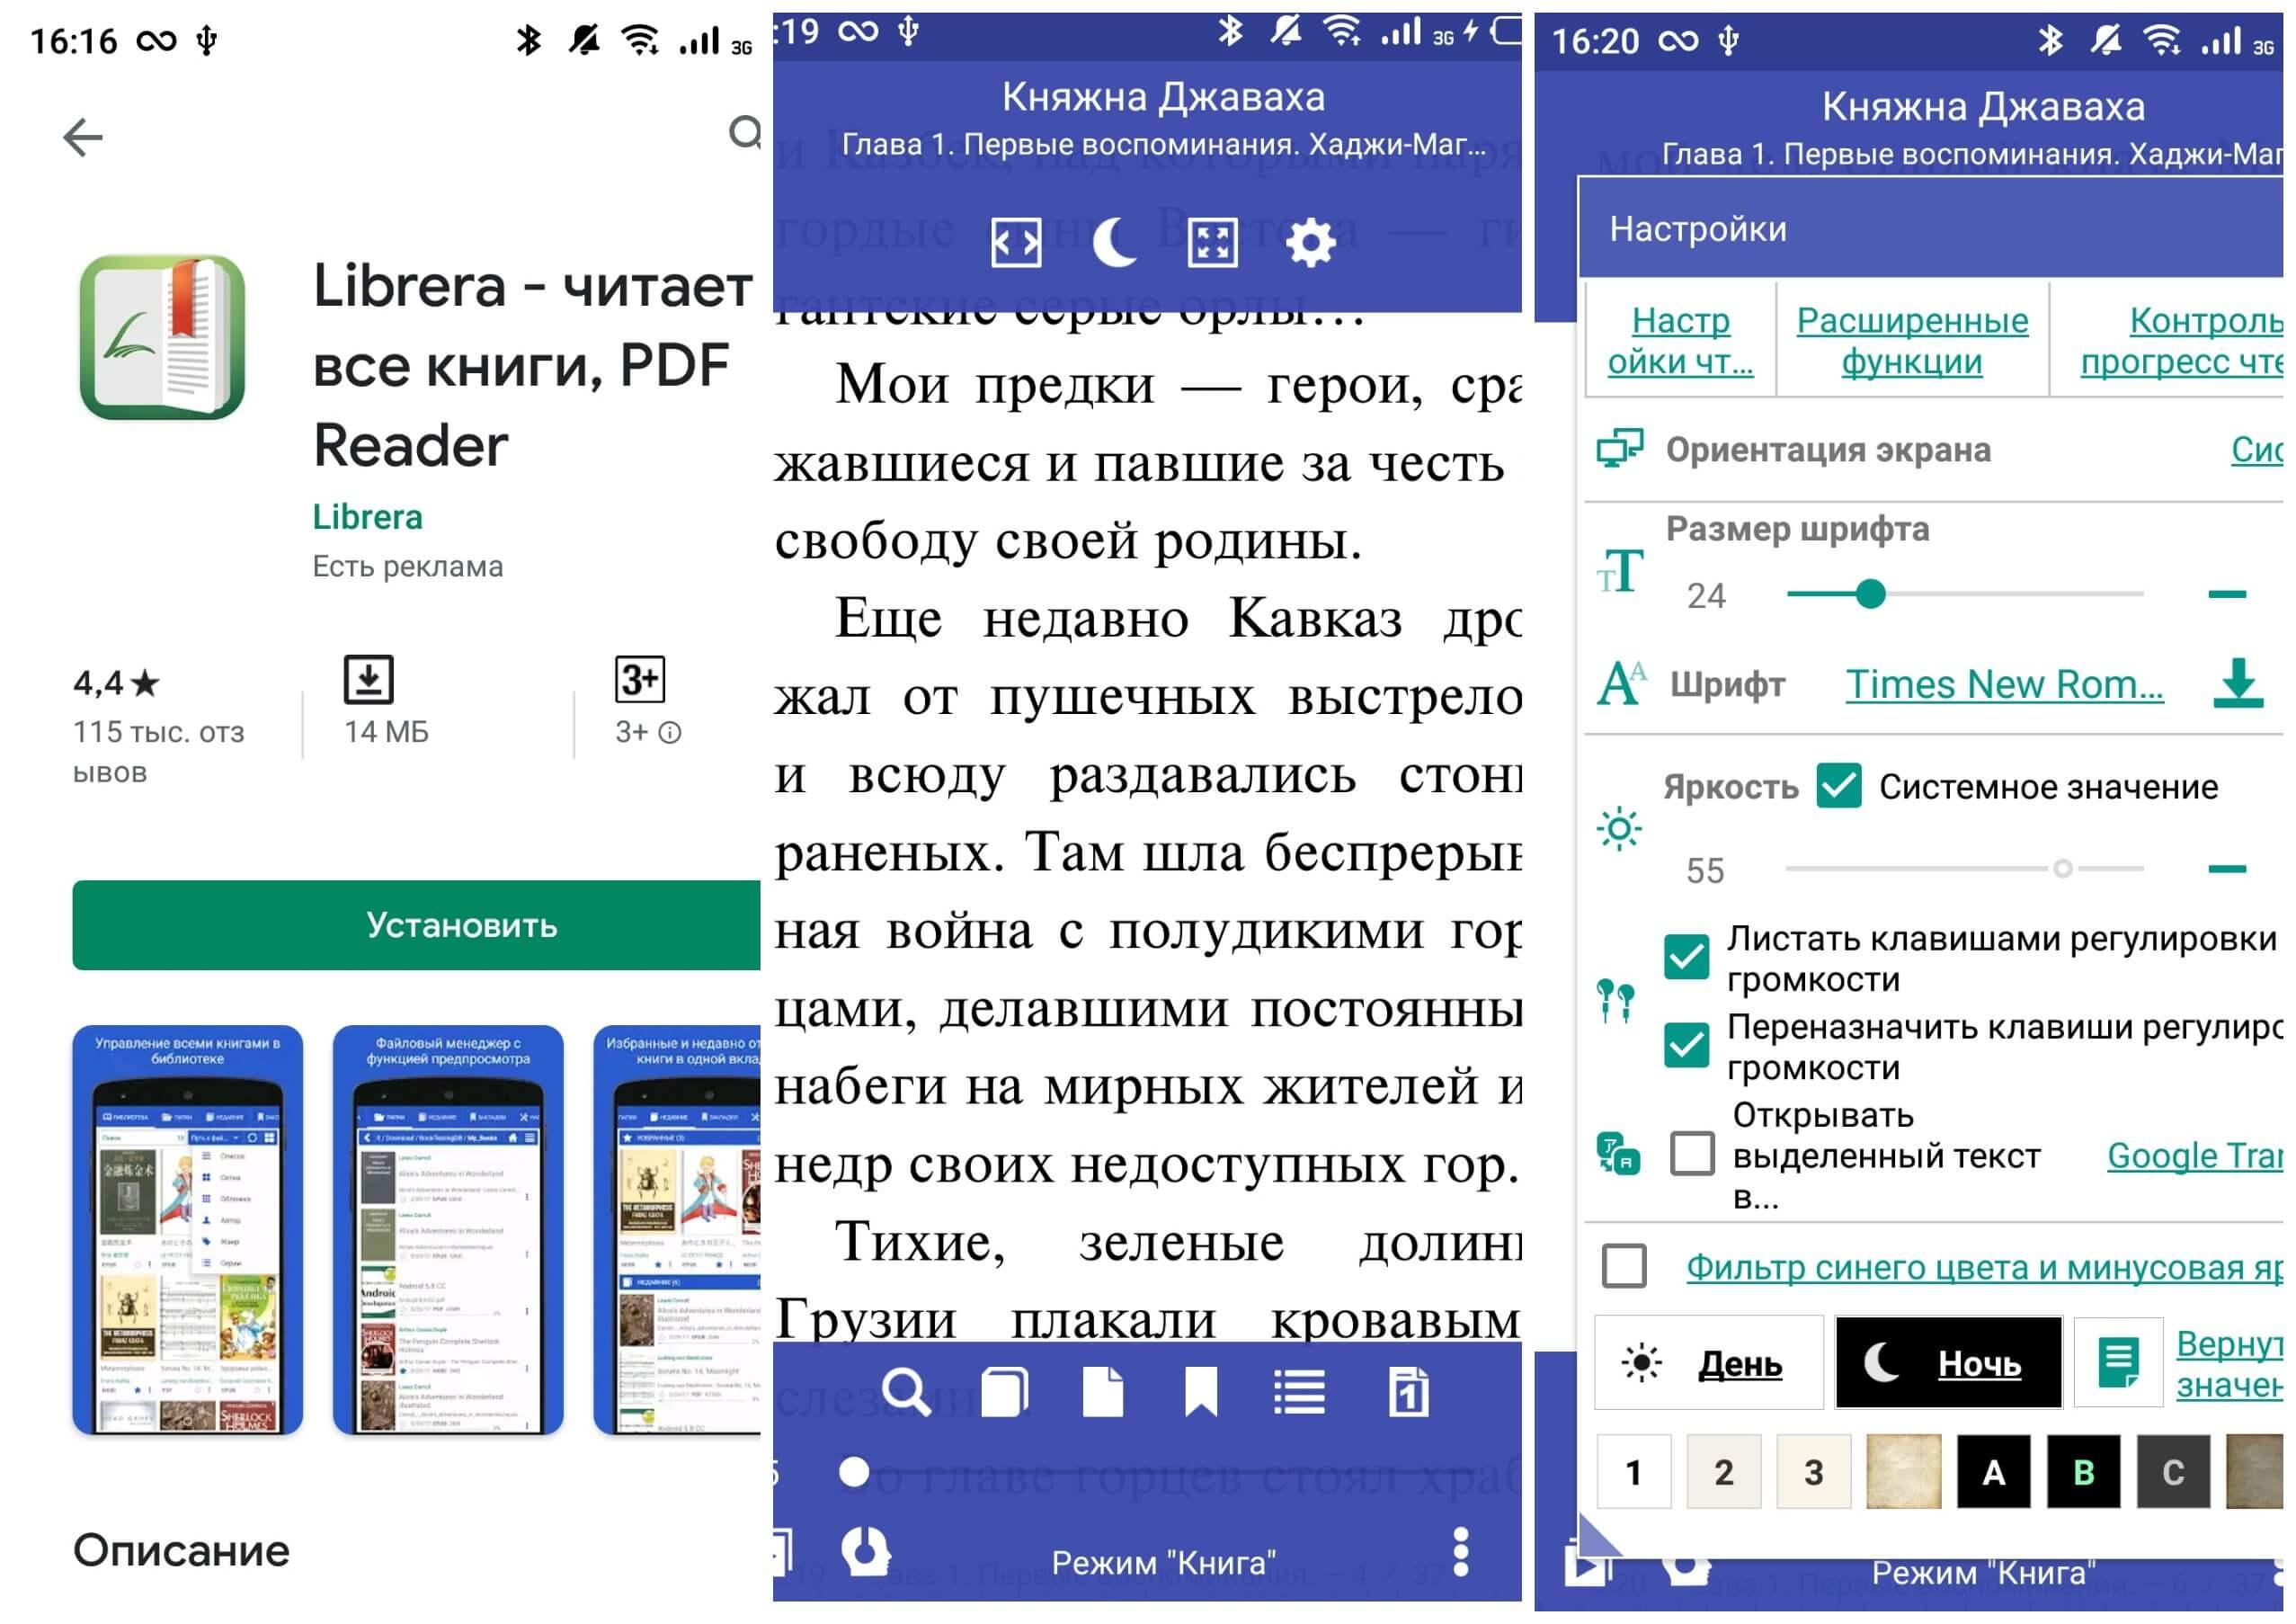 На фото изображено приложение Librera.